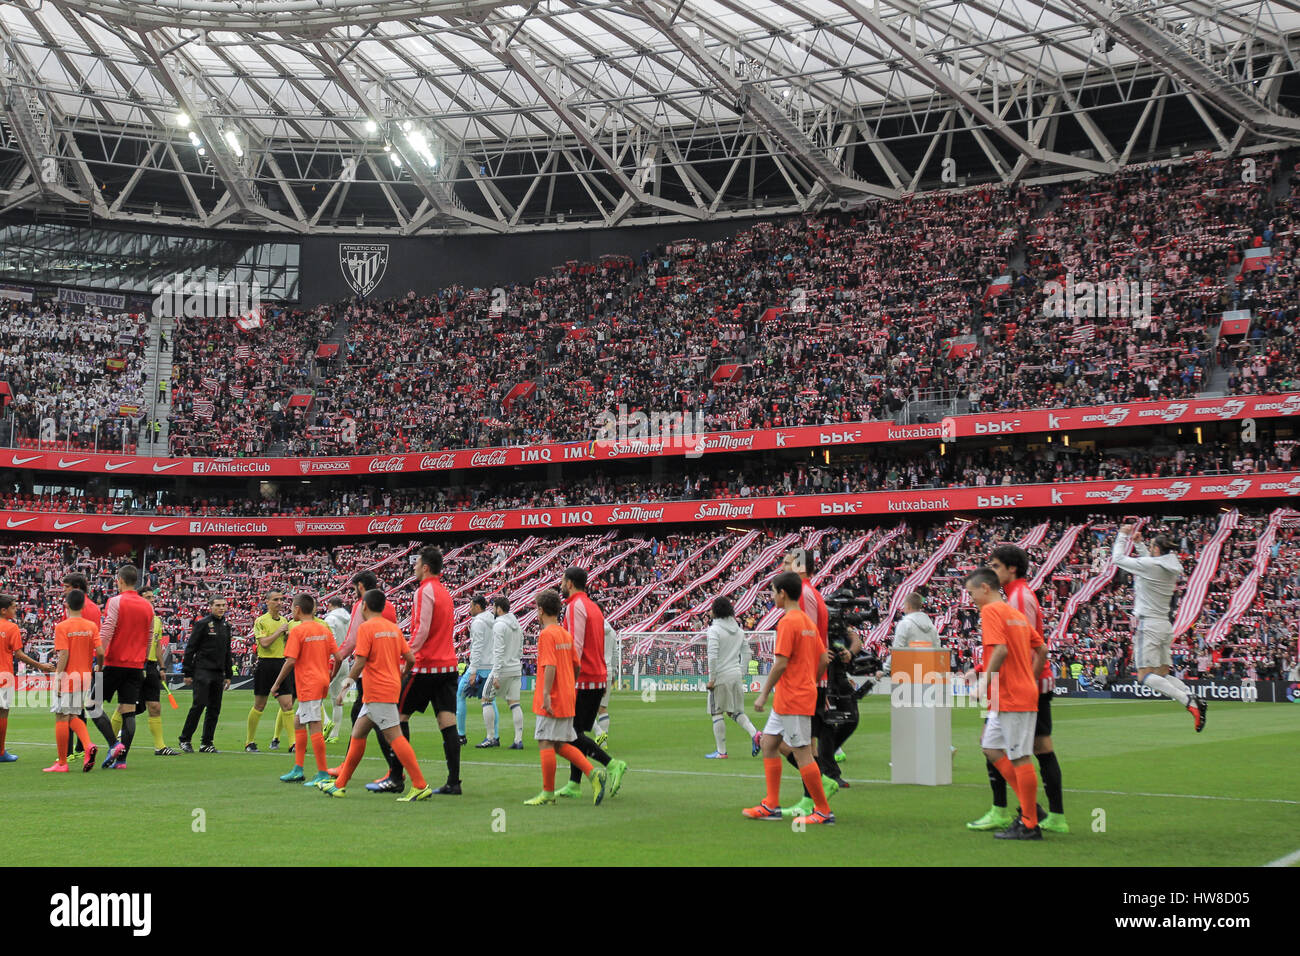 Bilbao, Vizcaya, Spain. 18th March, 2017. Both teams players before the Liga Santander match between Athletic Bilbao - Stock Image